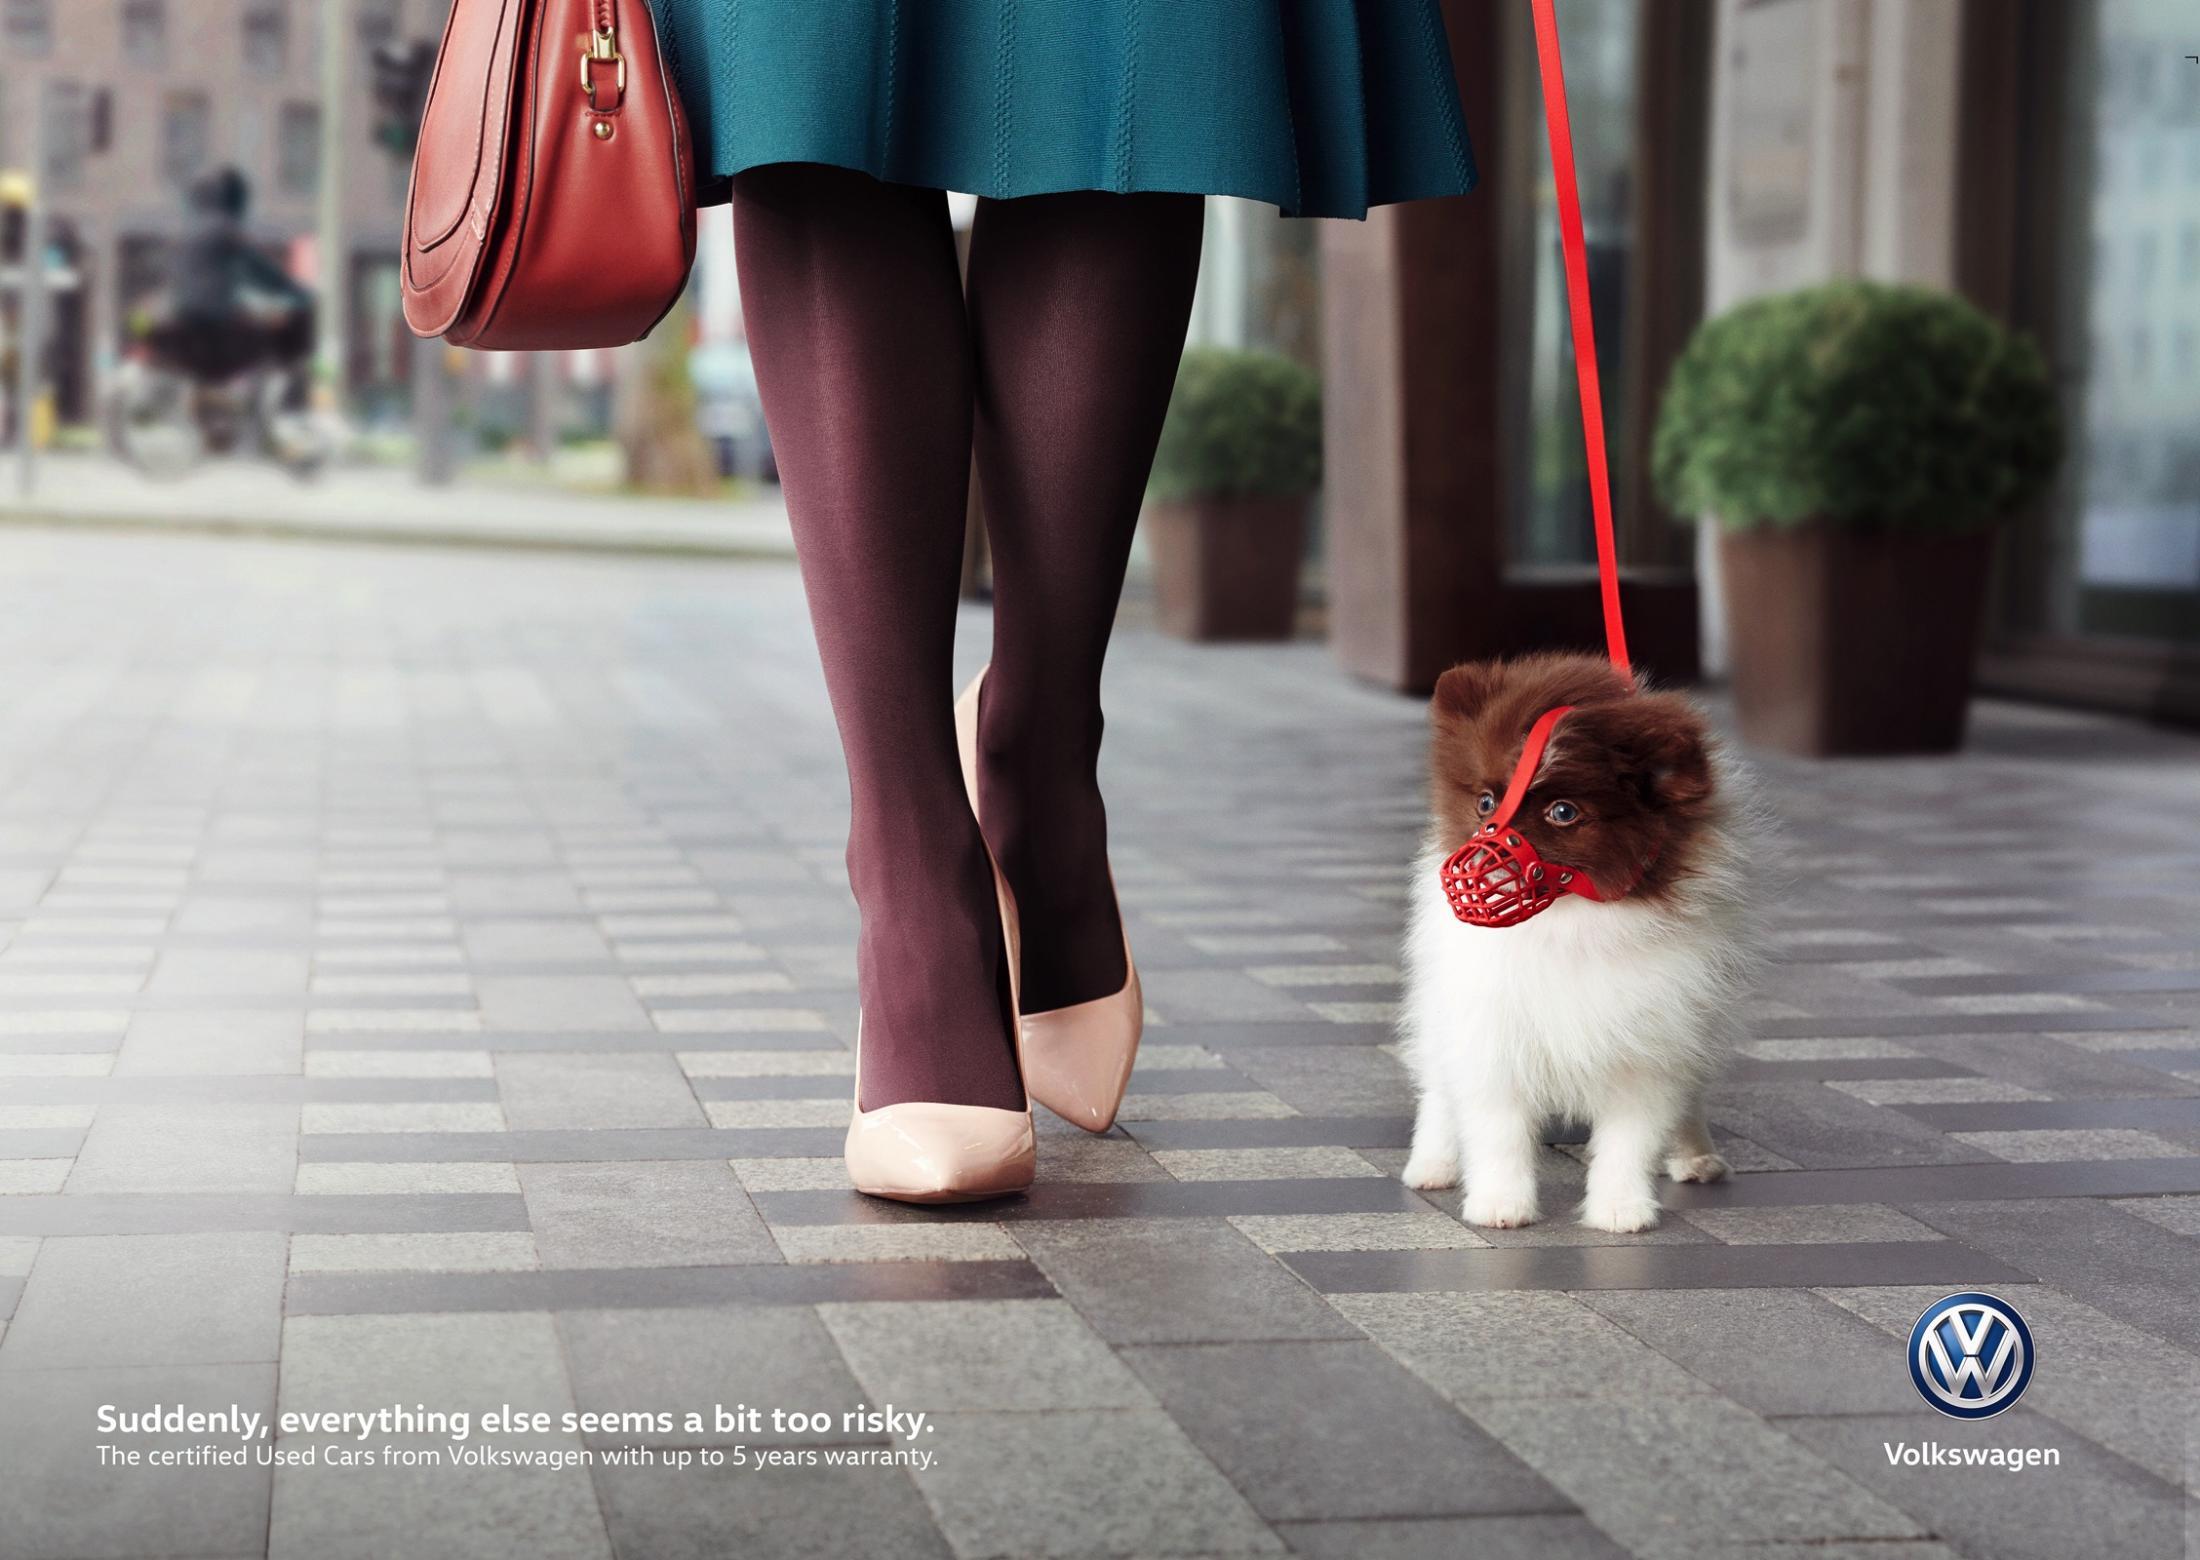 Volkswagen Print Ad - A Bit Too Risky - Puppy